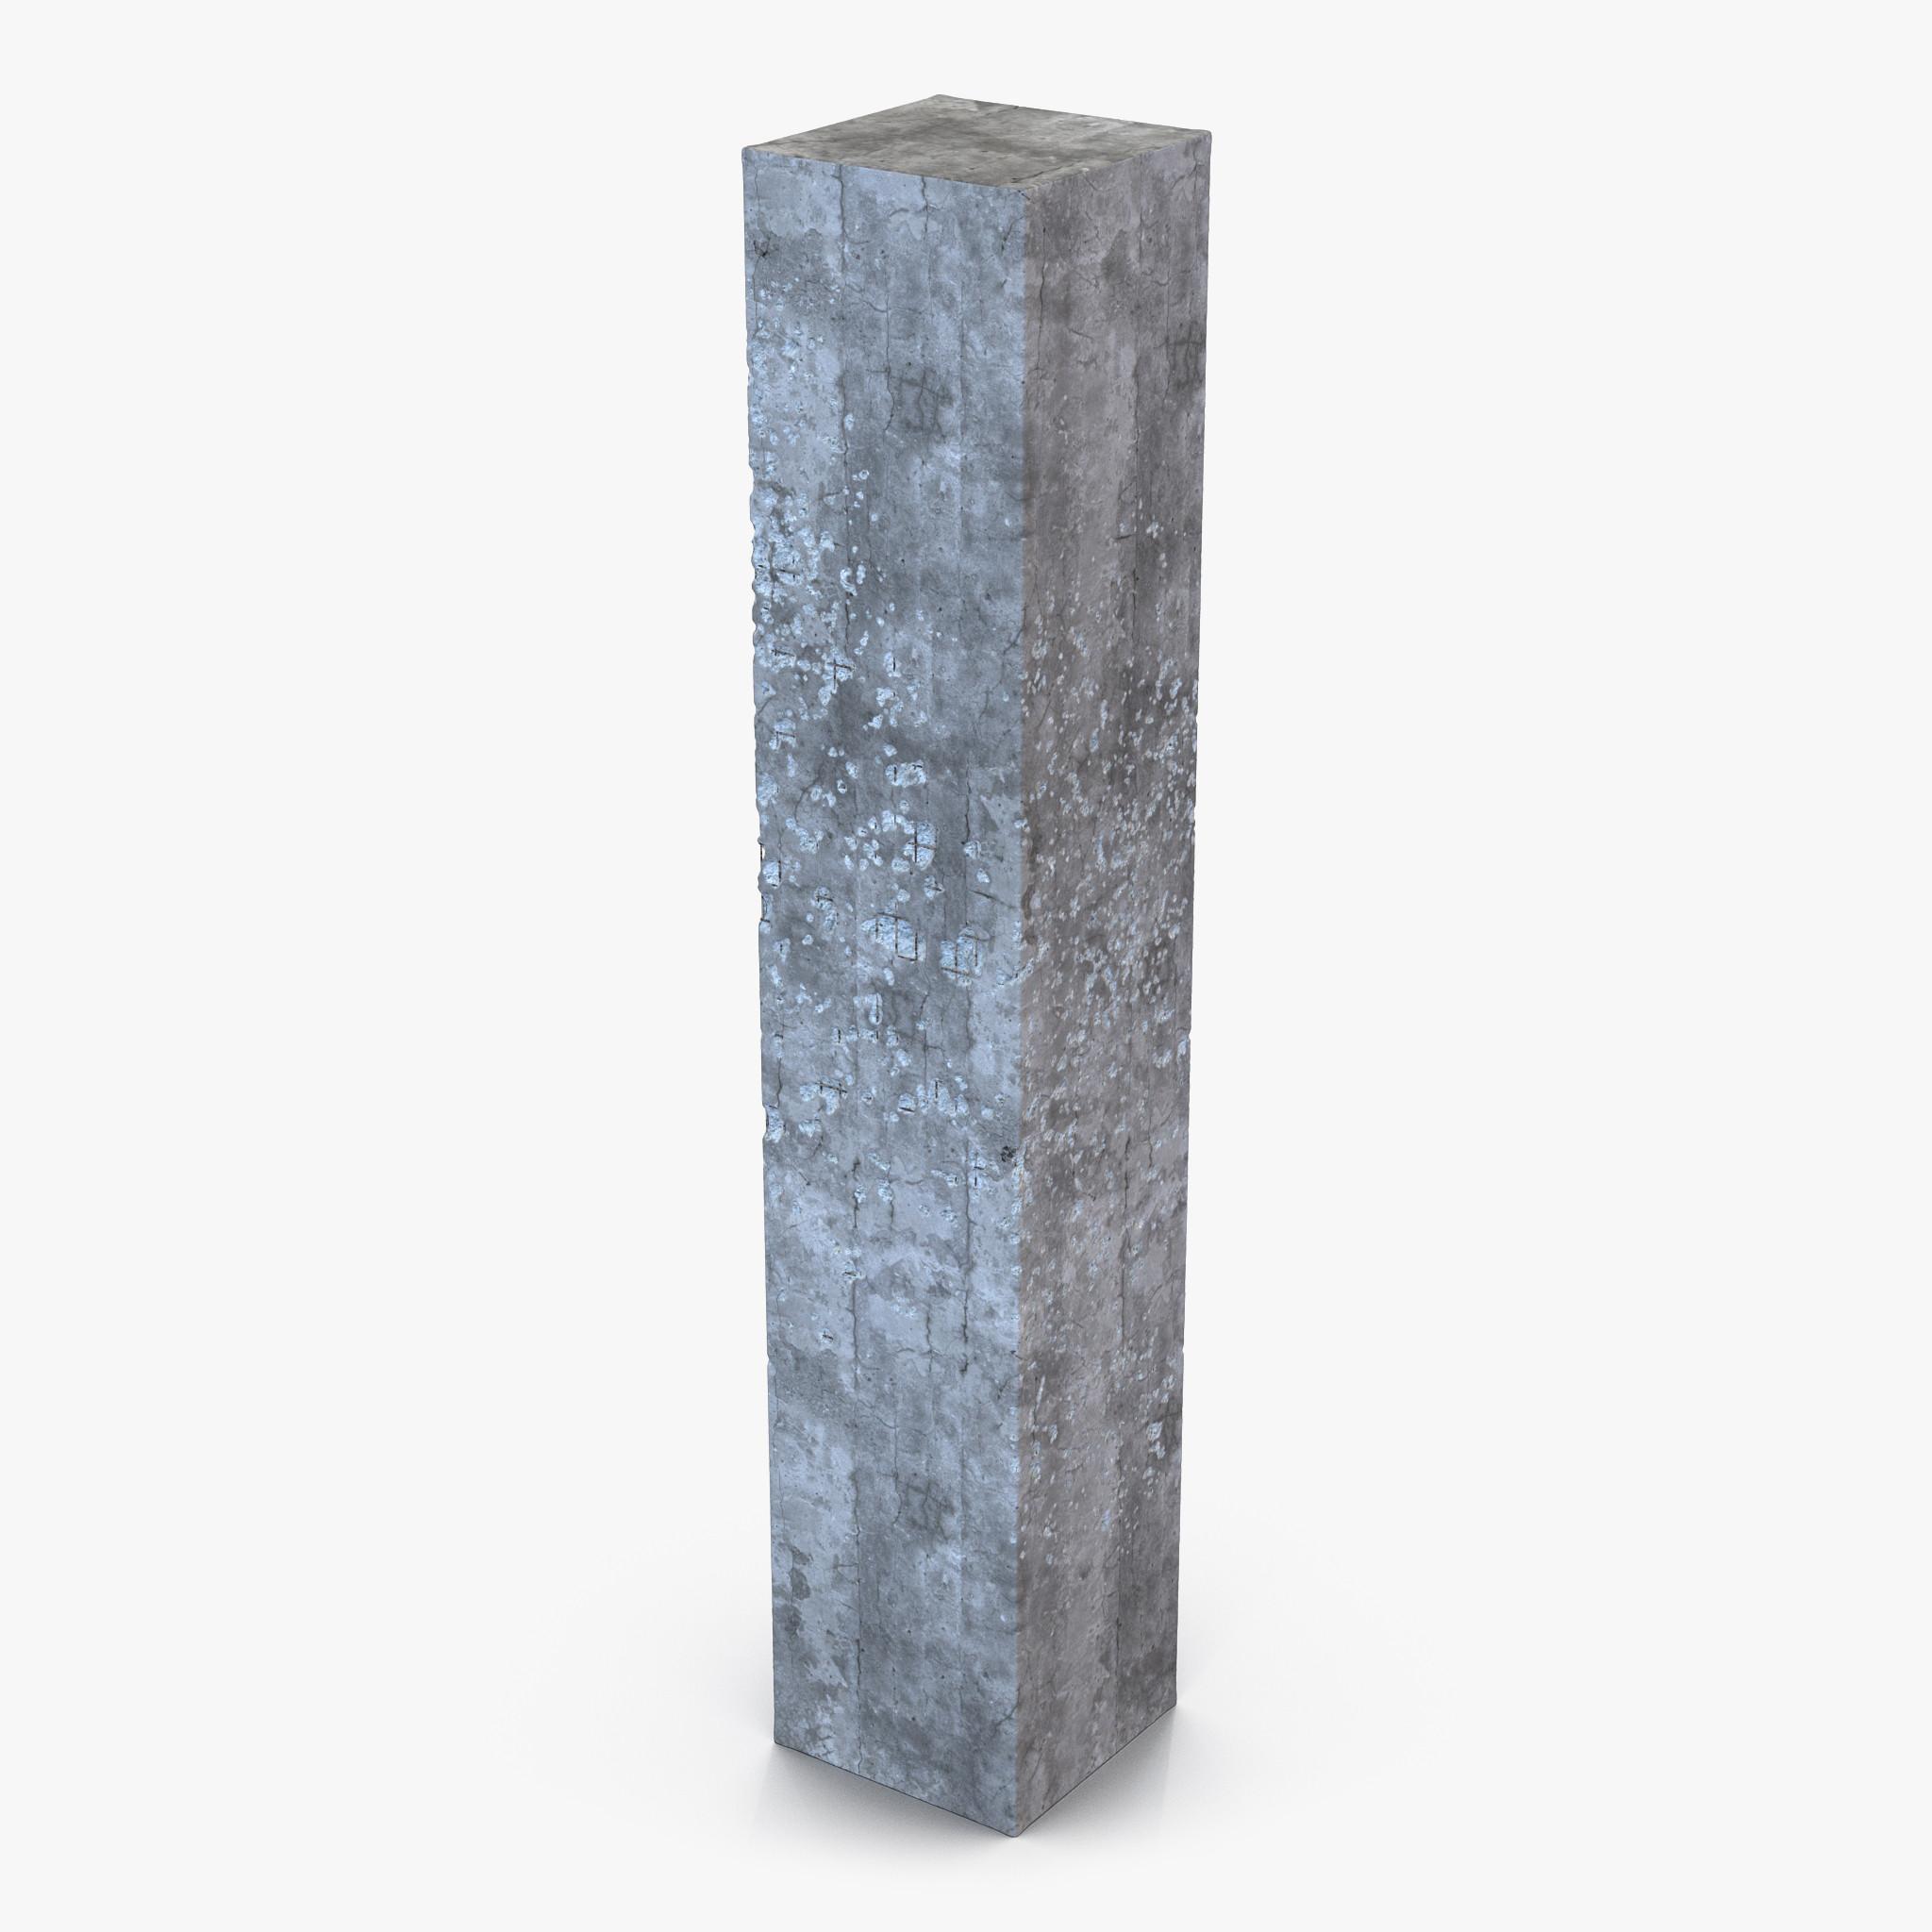 Concrete Pillar 3d model 01.jpg